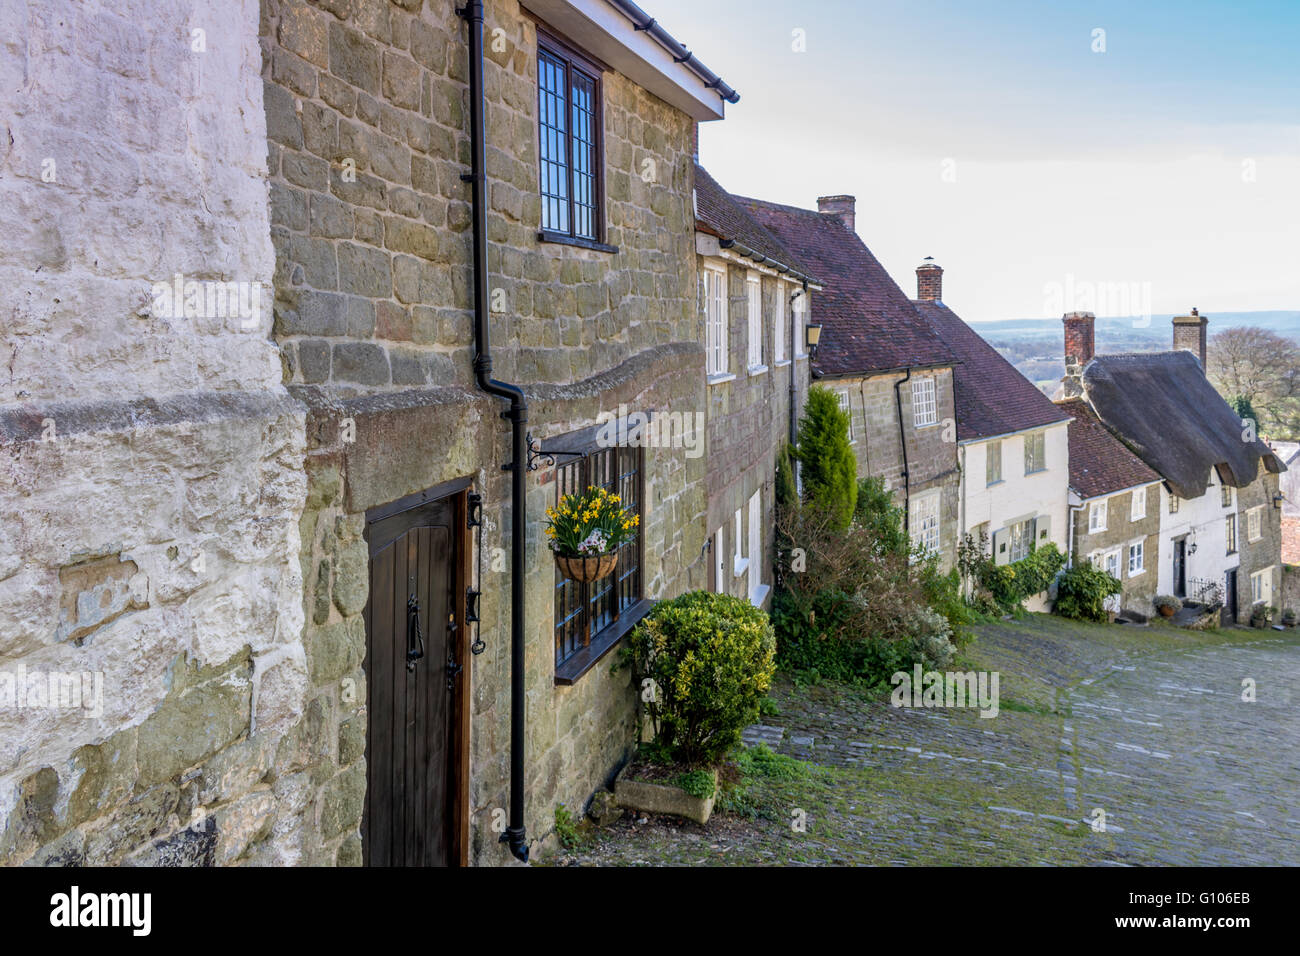 England Dorset Shaftesbury Gold Hill - Stock Image